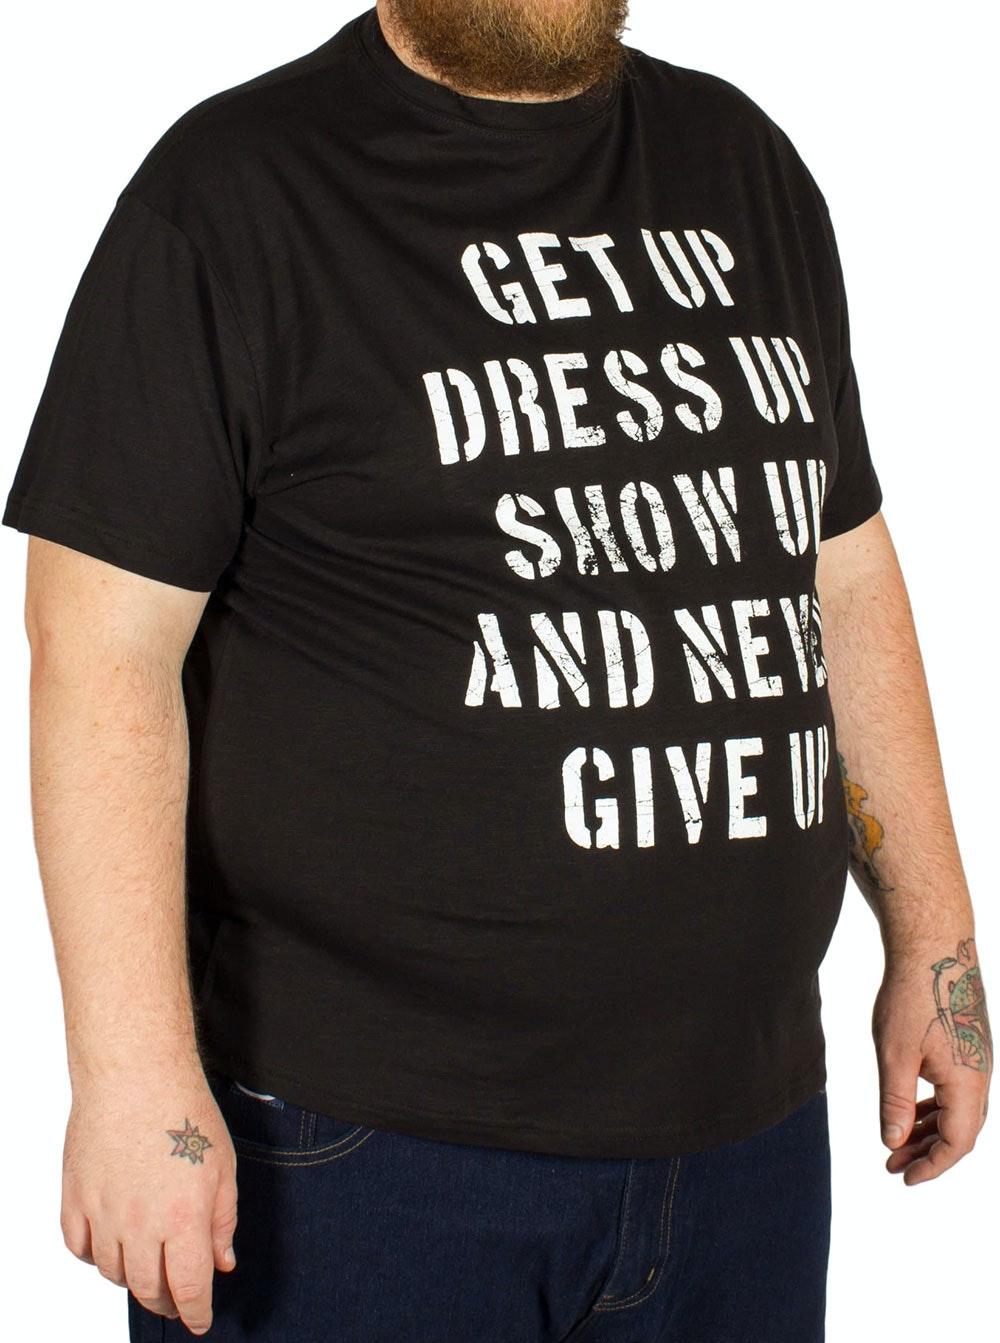 Replika 'Give Up' Printed T-Shirt Black